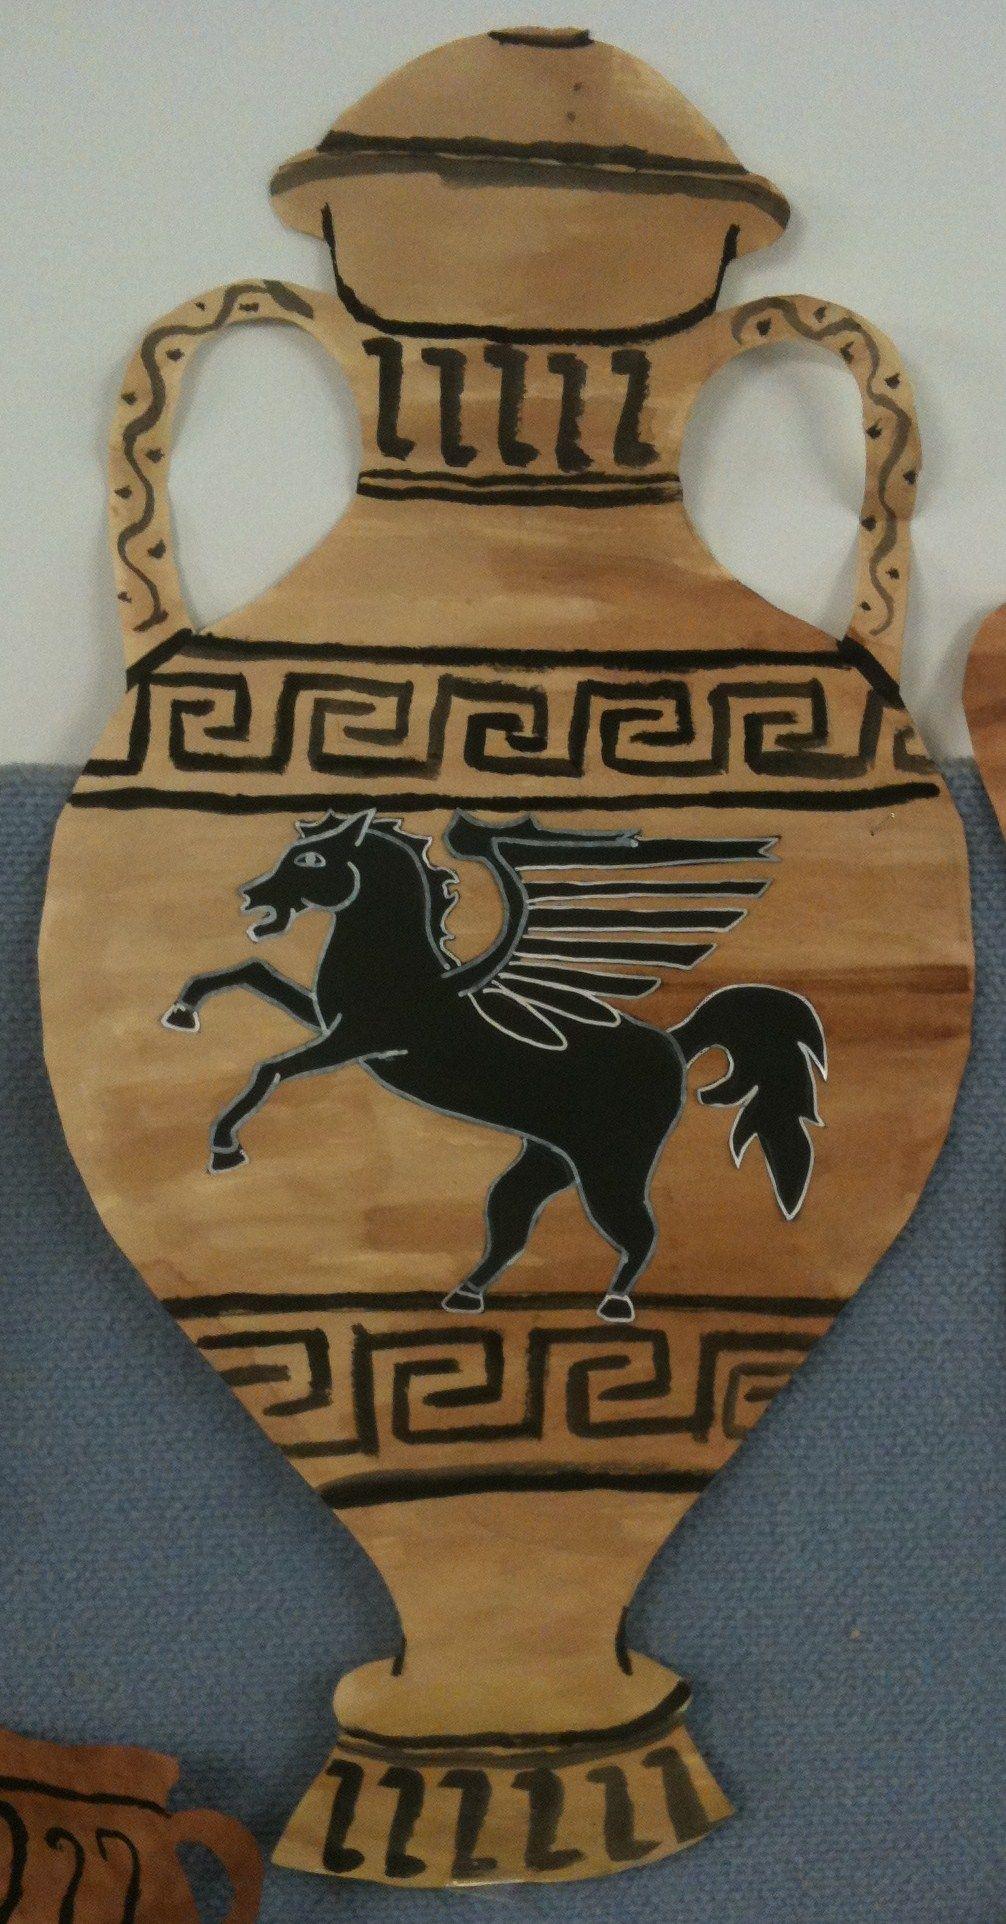 Ancient Greek Amphora - Ancient Greece Art and History Project Sixth/Seventh Grade